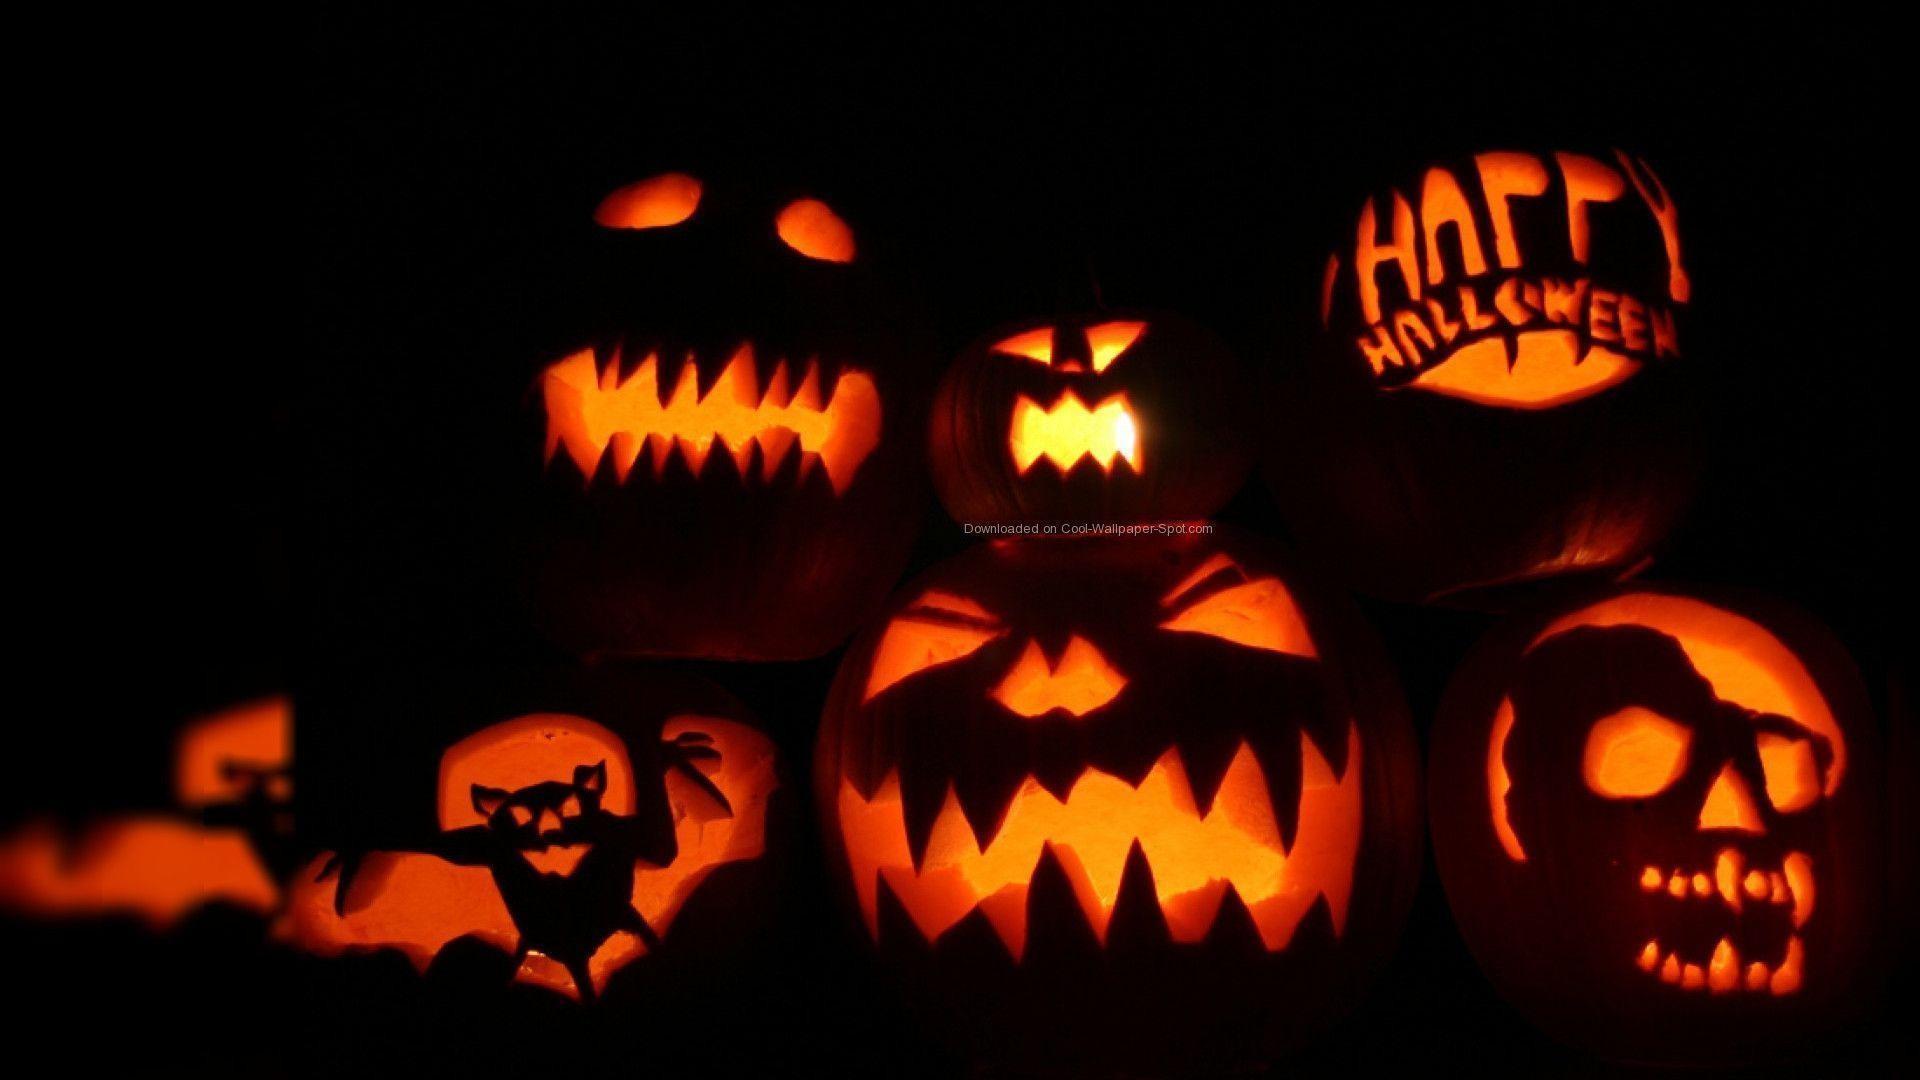 Simple Wallpaper Halloween Ipod 5 - 581092  Image_53276.jpg